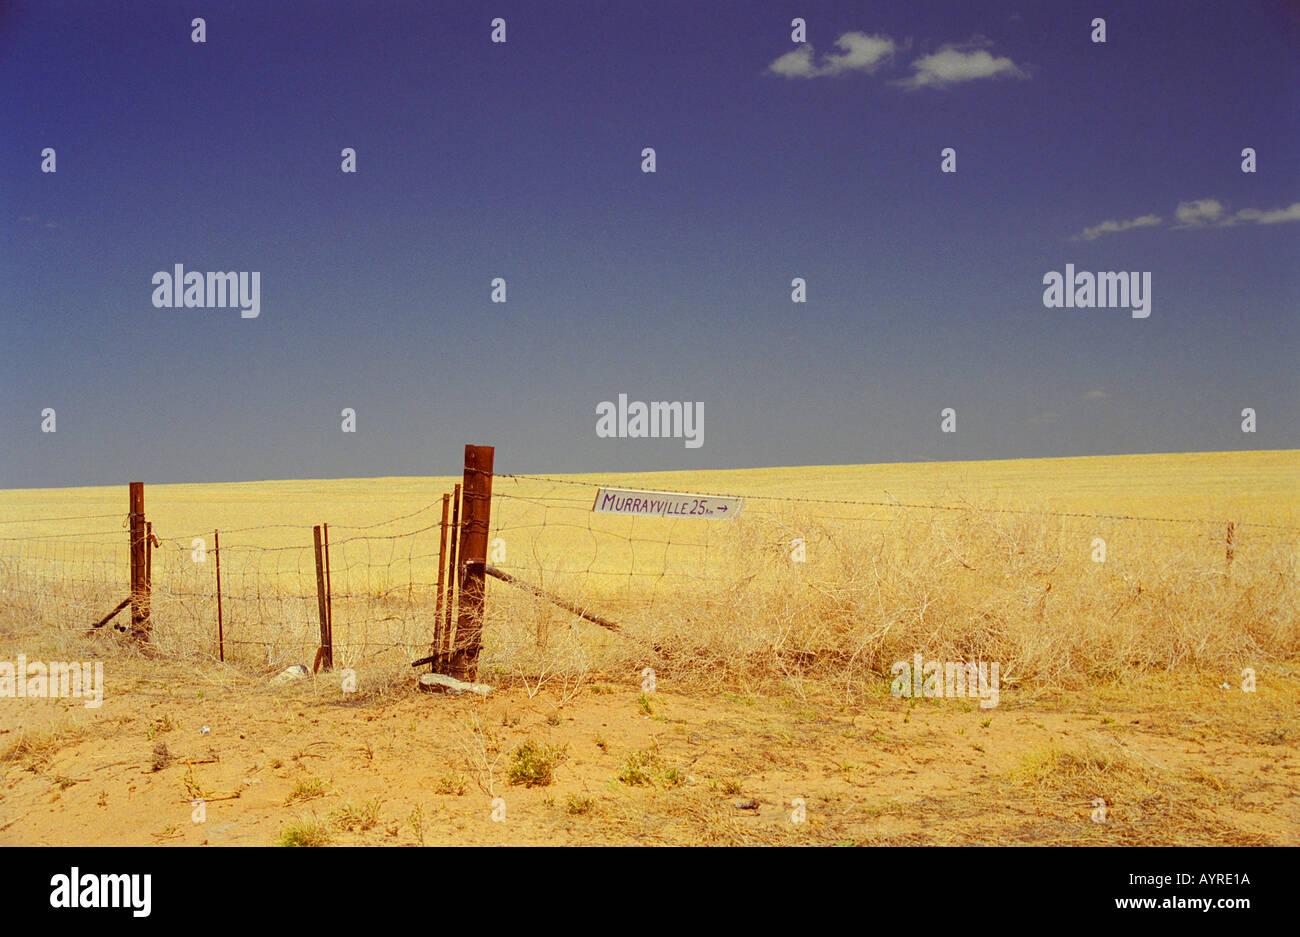 Outback Australia - Stock Image